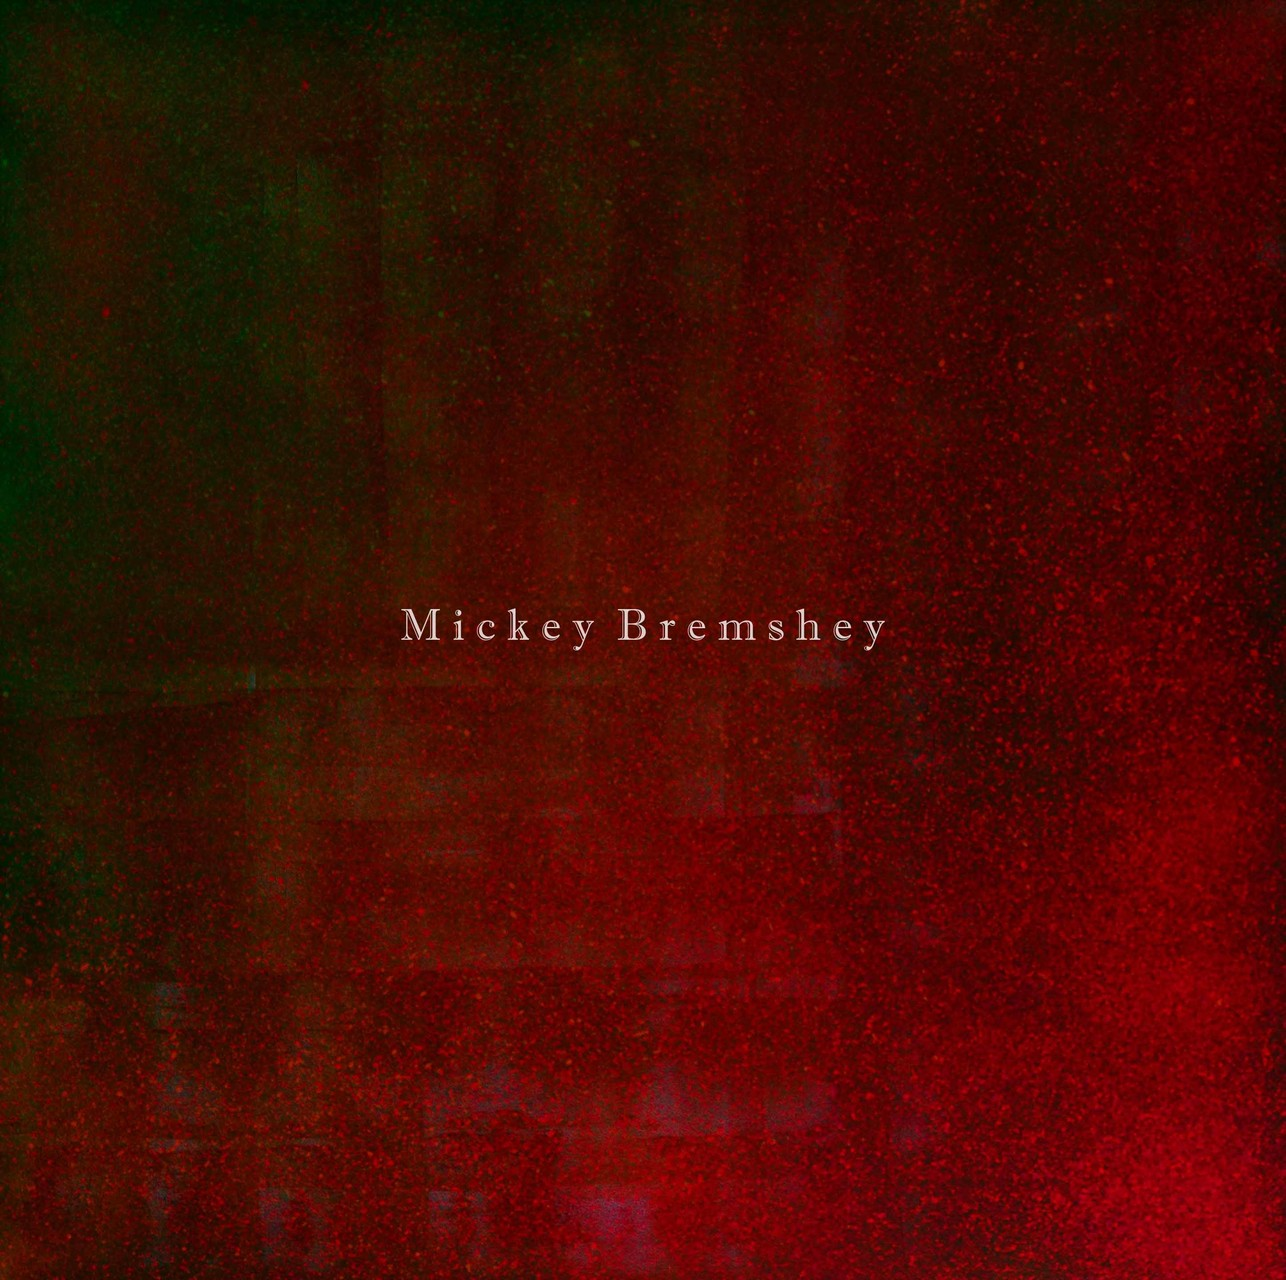 bremshey.illuminare.081275-007